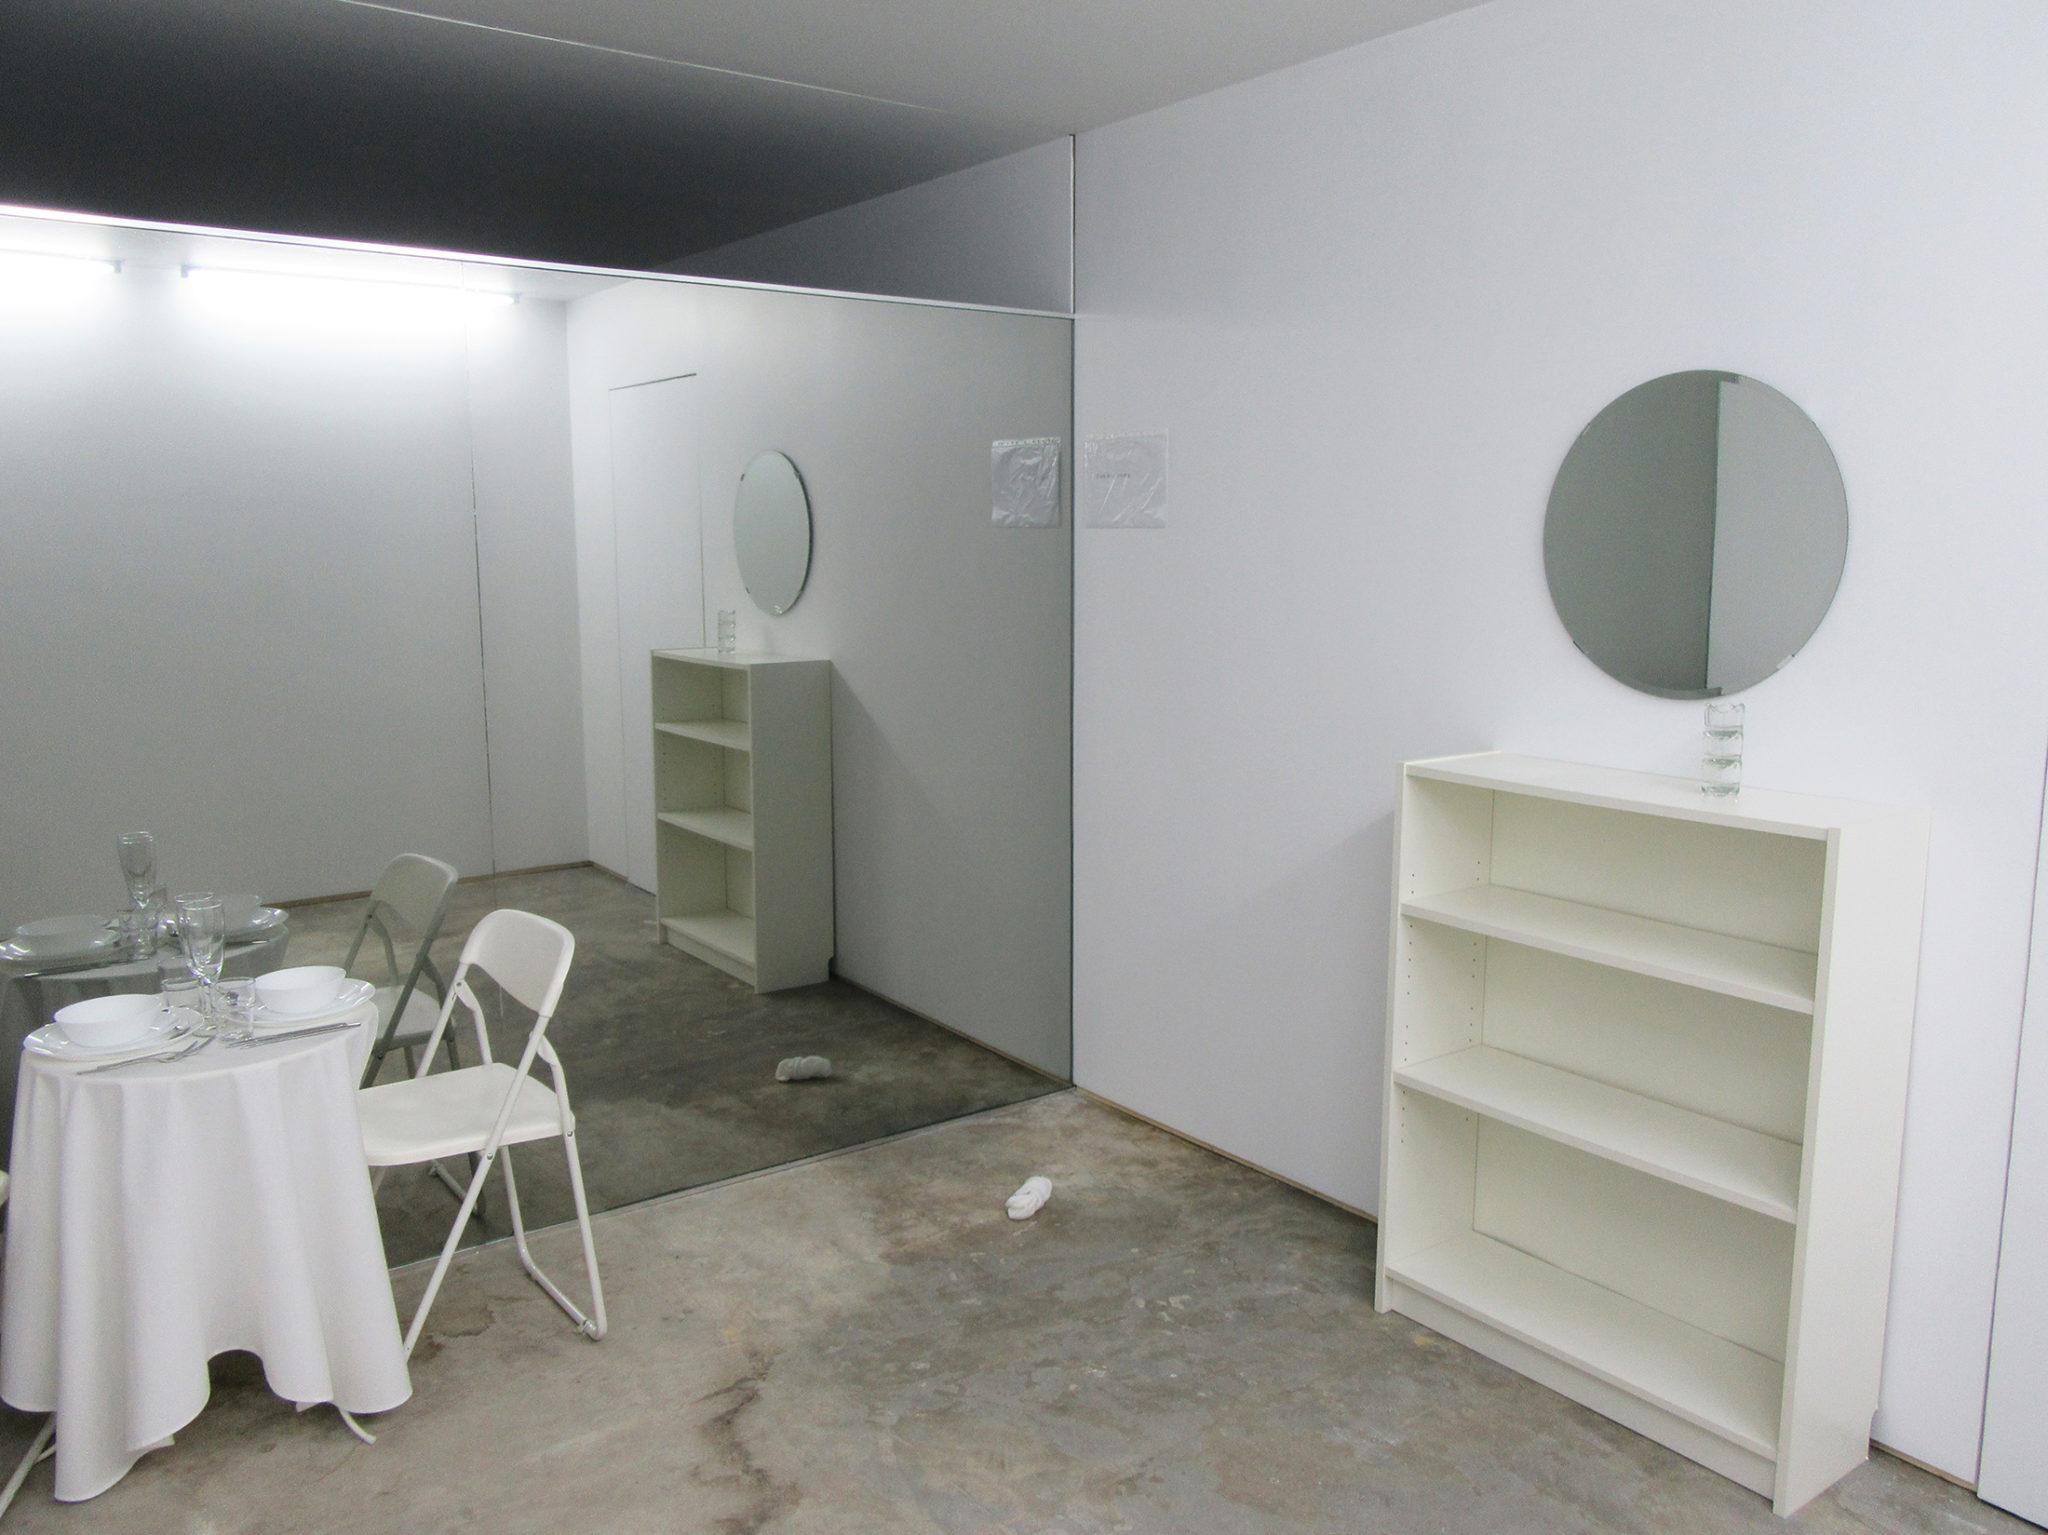 sannahelenaberger-theedgemustbescalloped-diorama-17